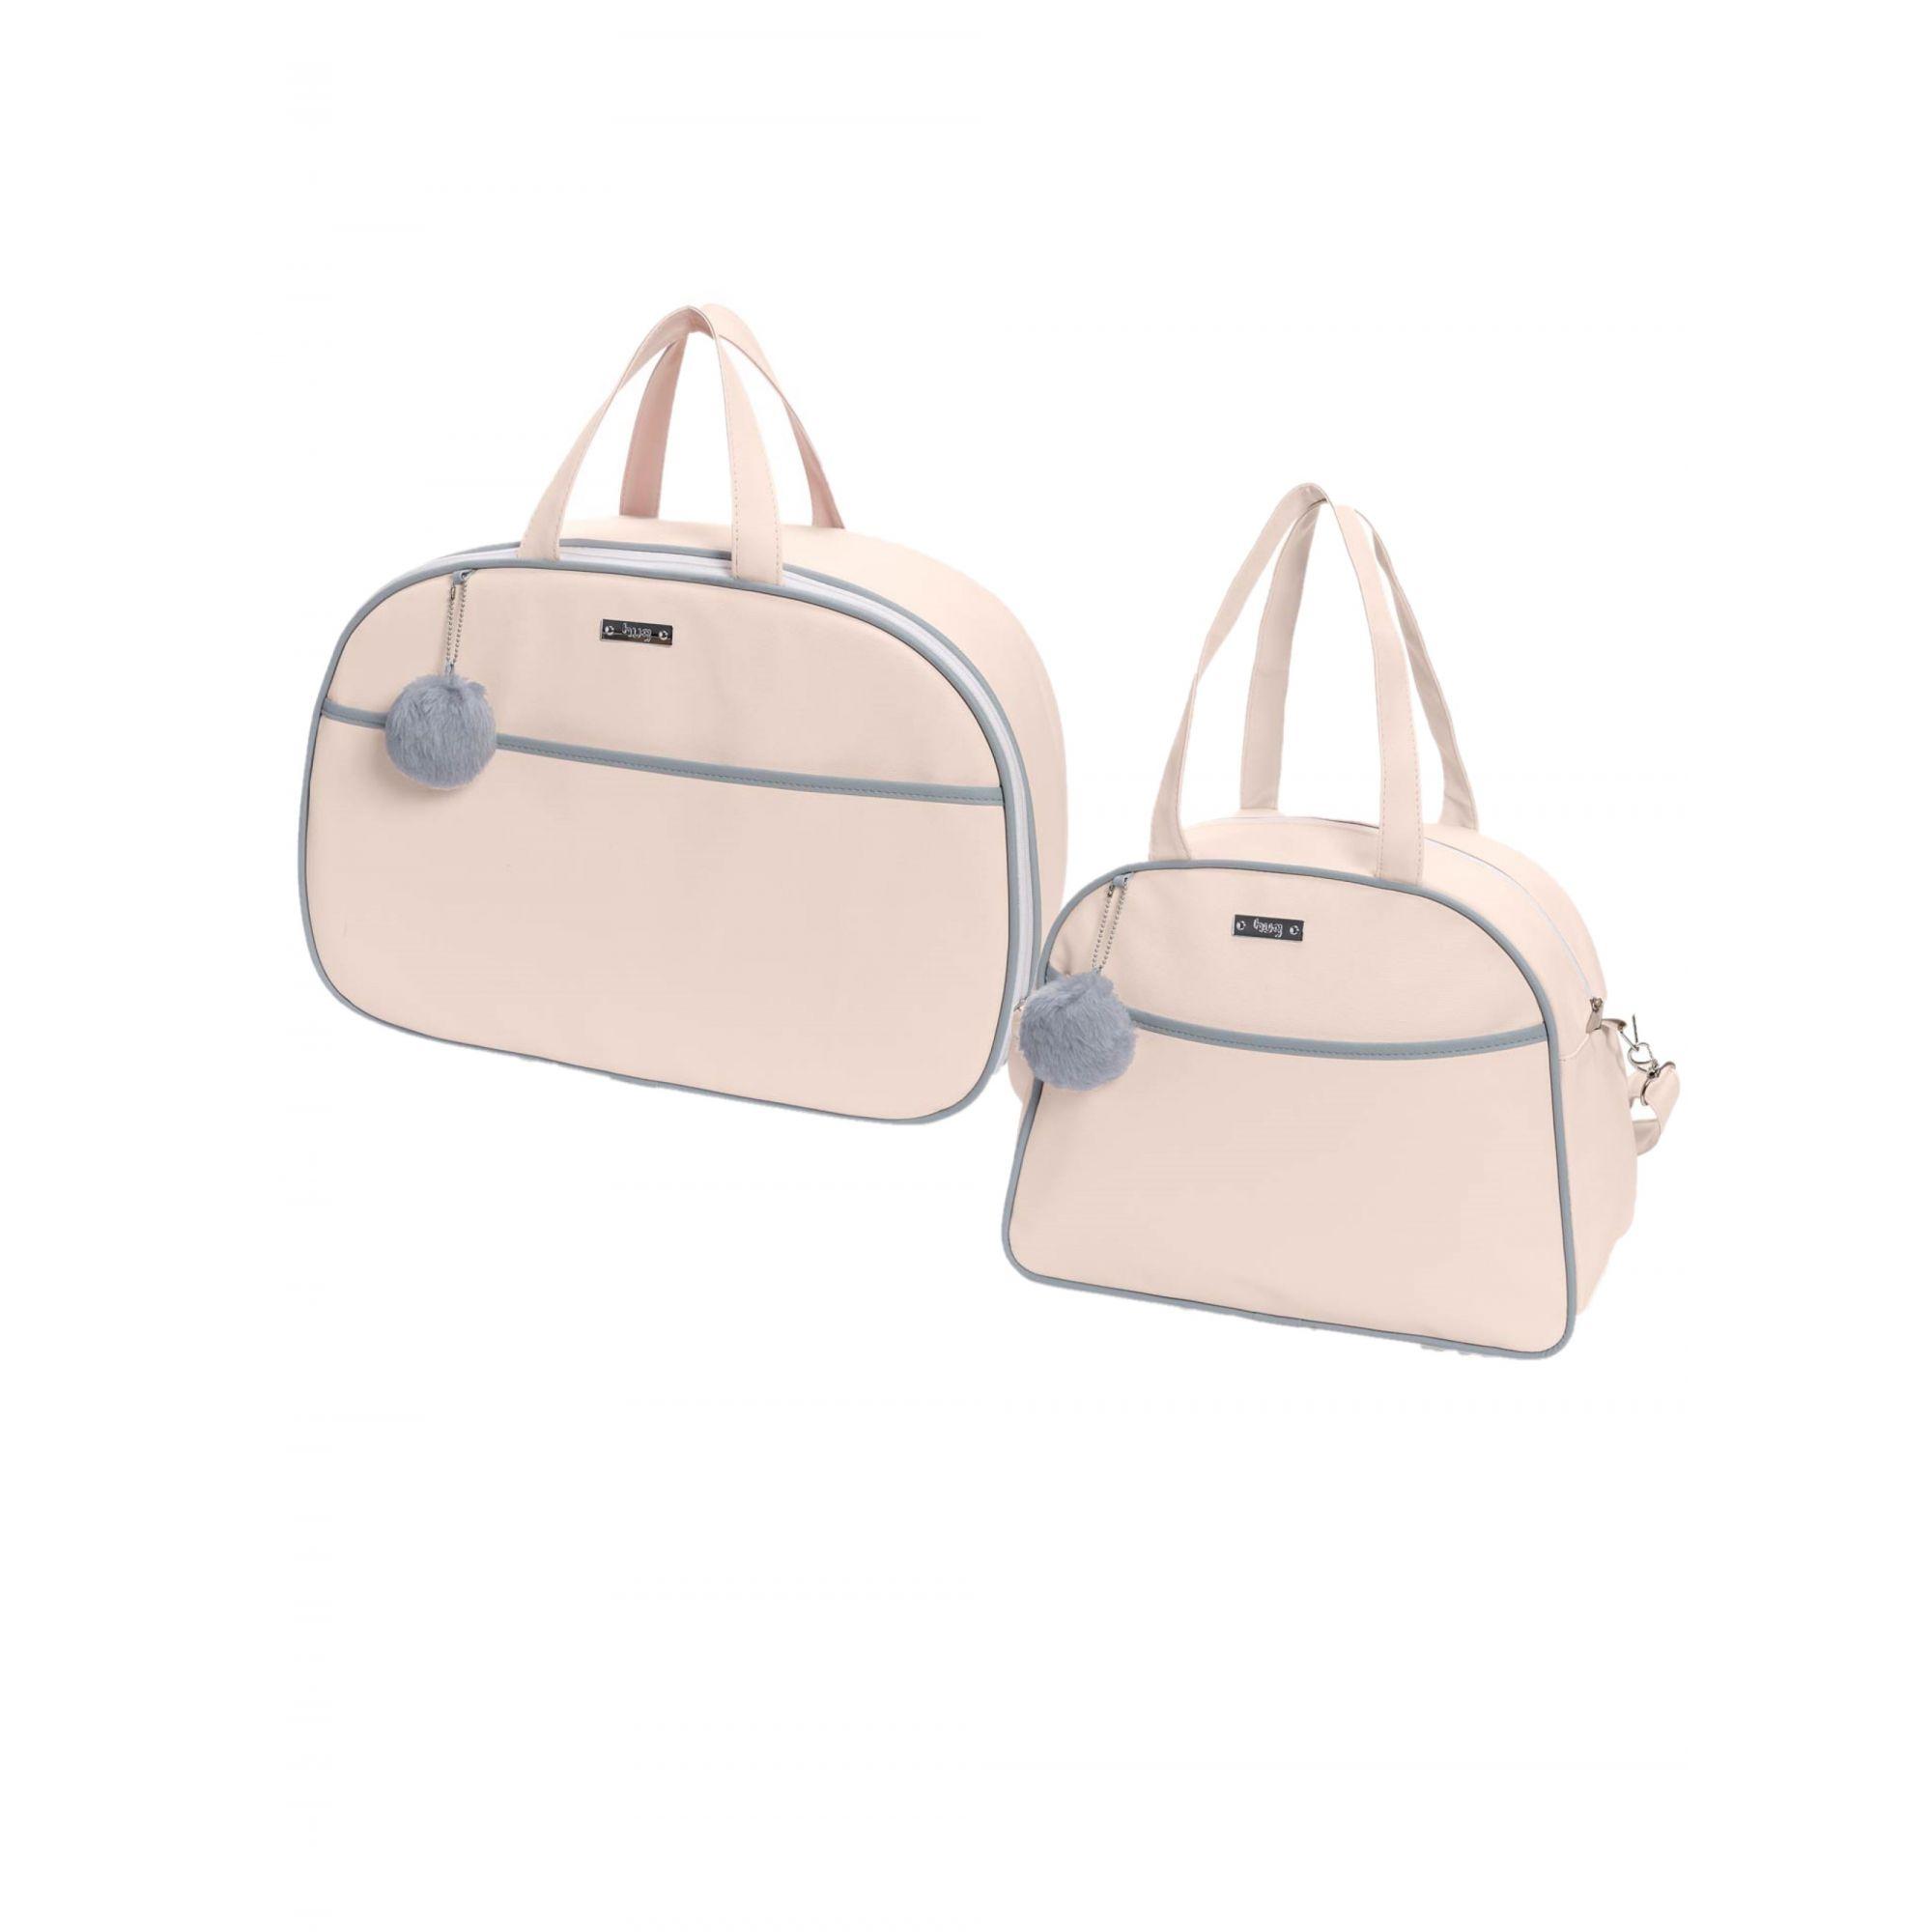 Kit bolsa de maternidade Rosa Berlim - 2 pçs - Hug (bolsa e mala)